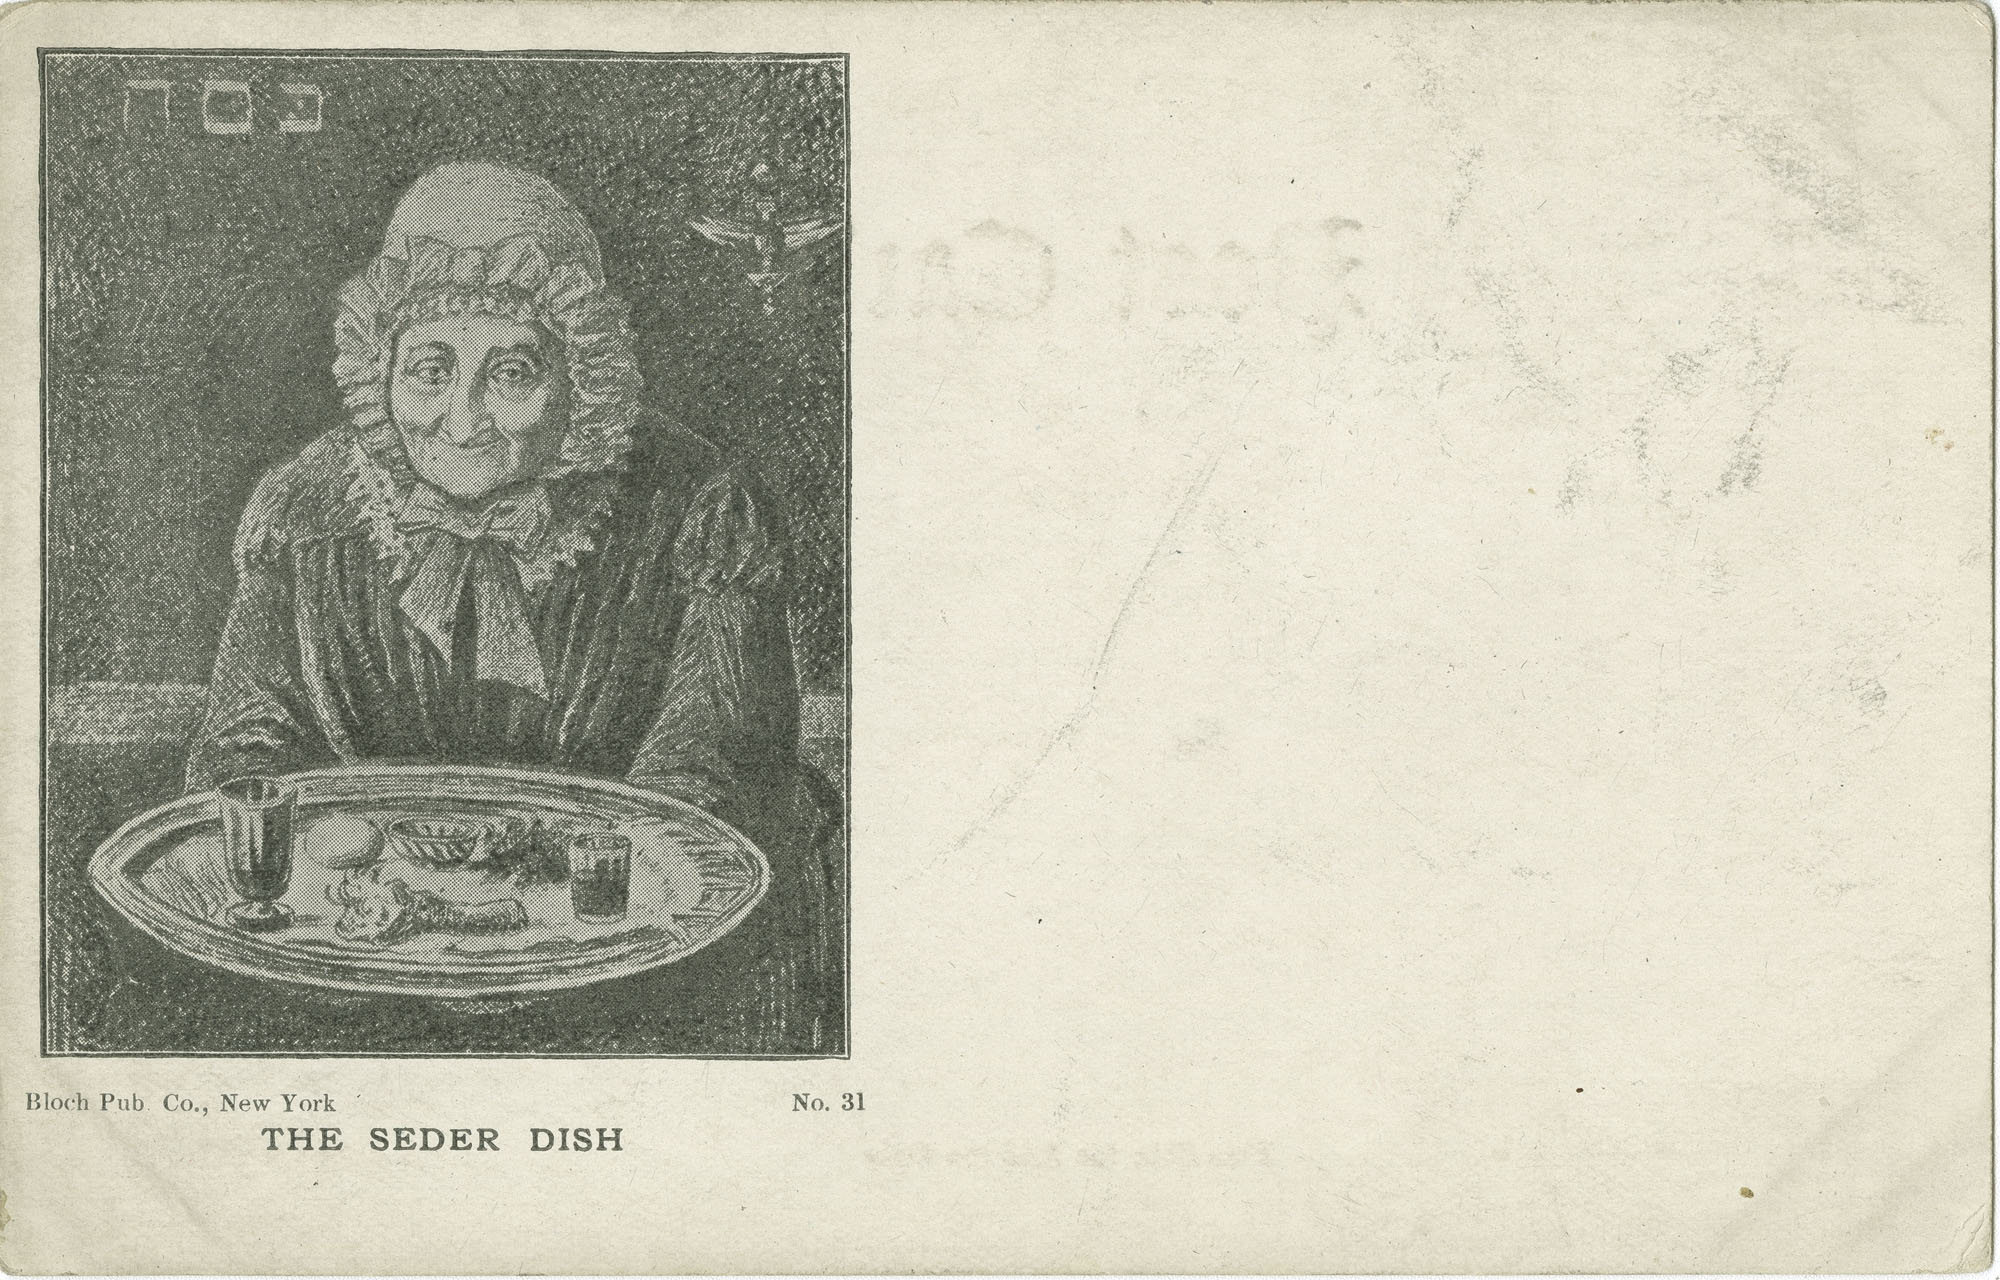 The Seder Dish